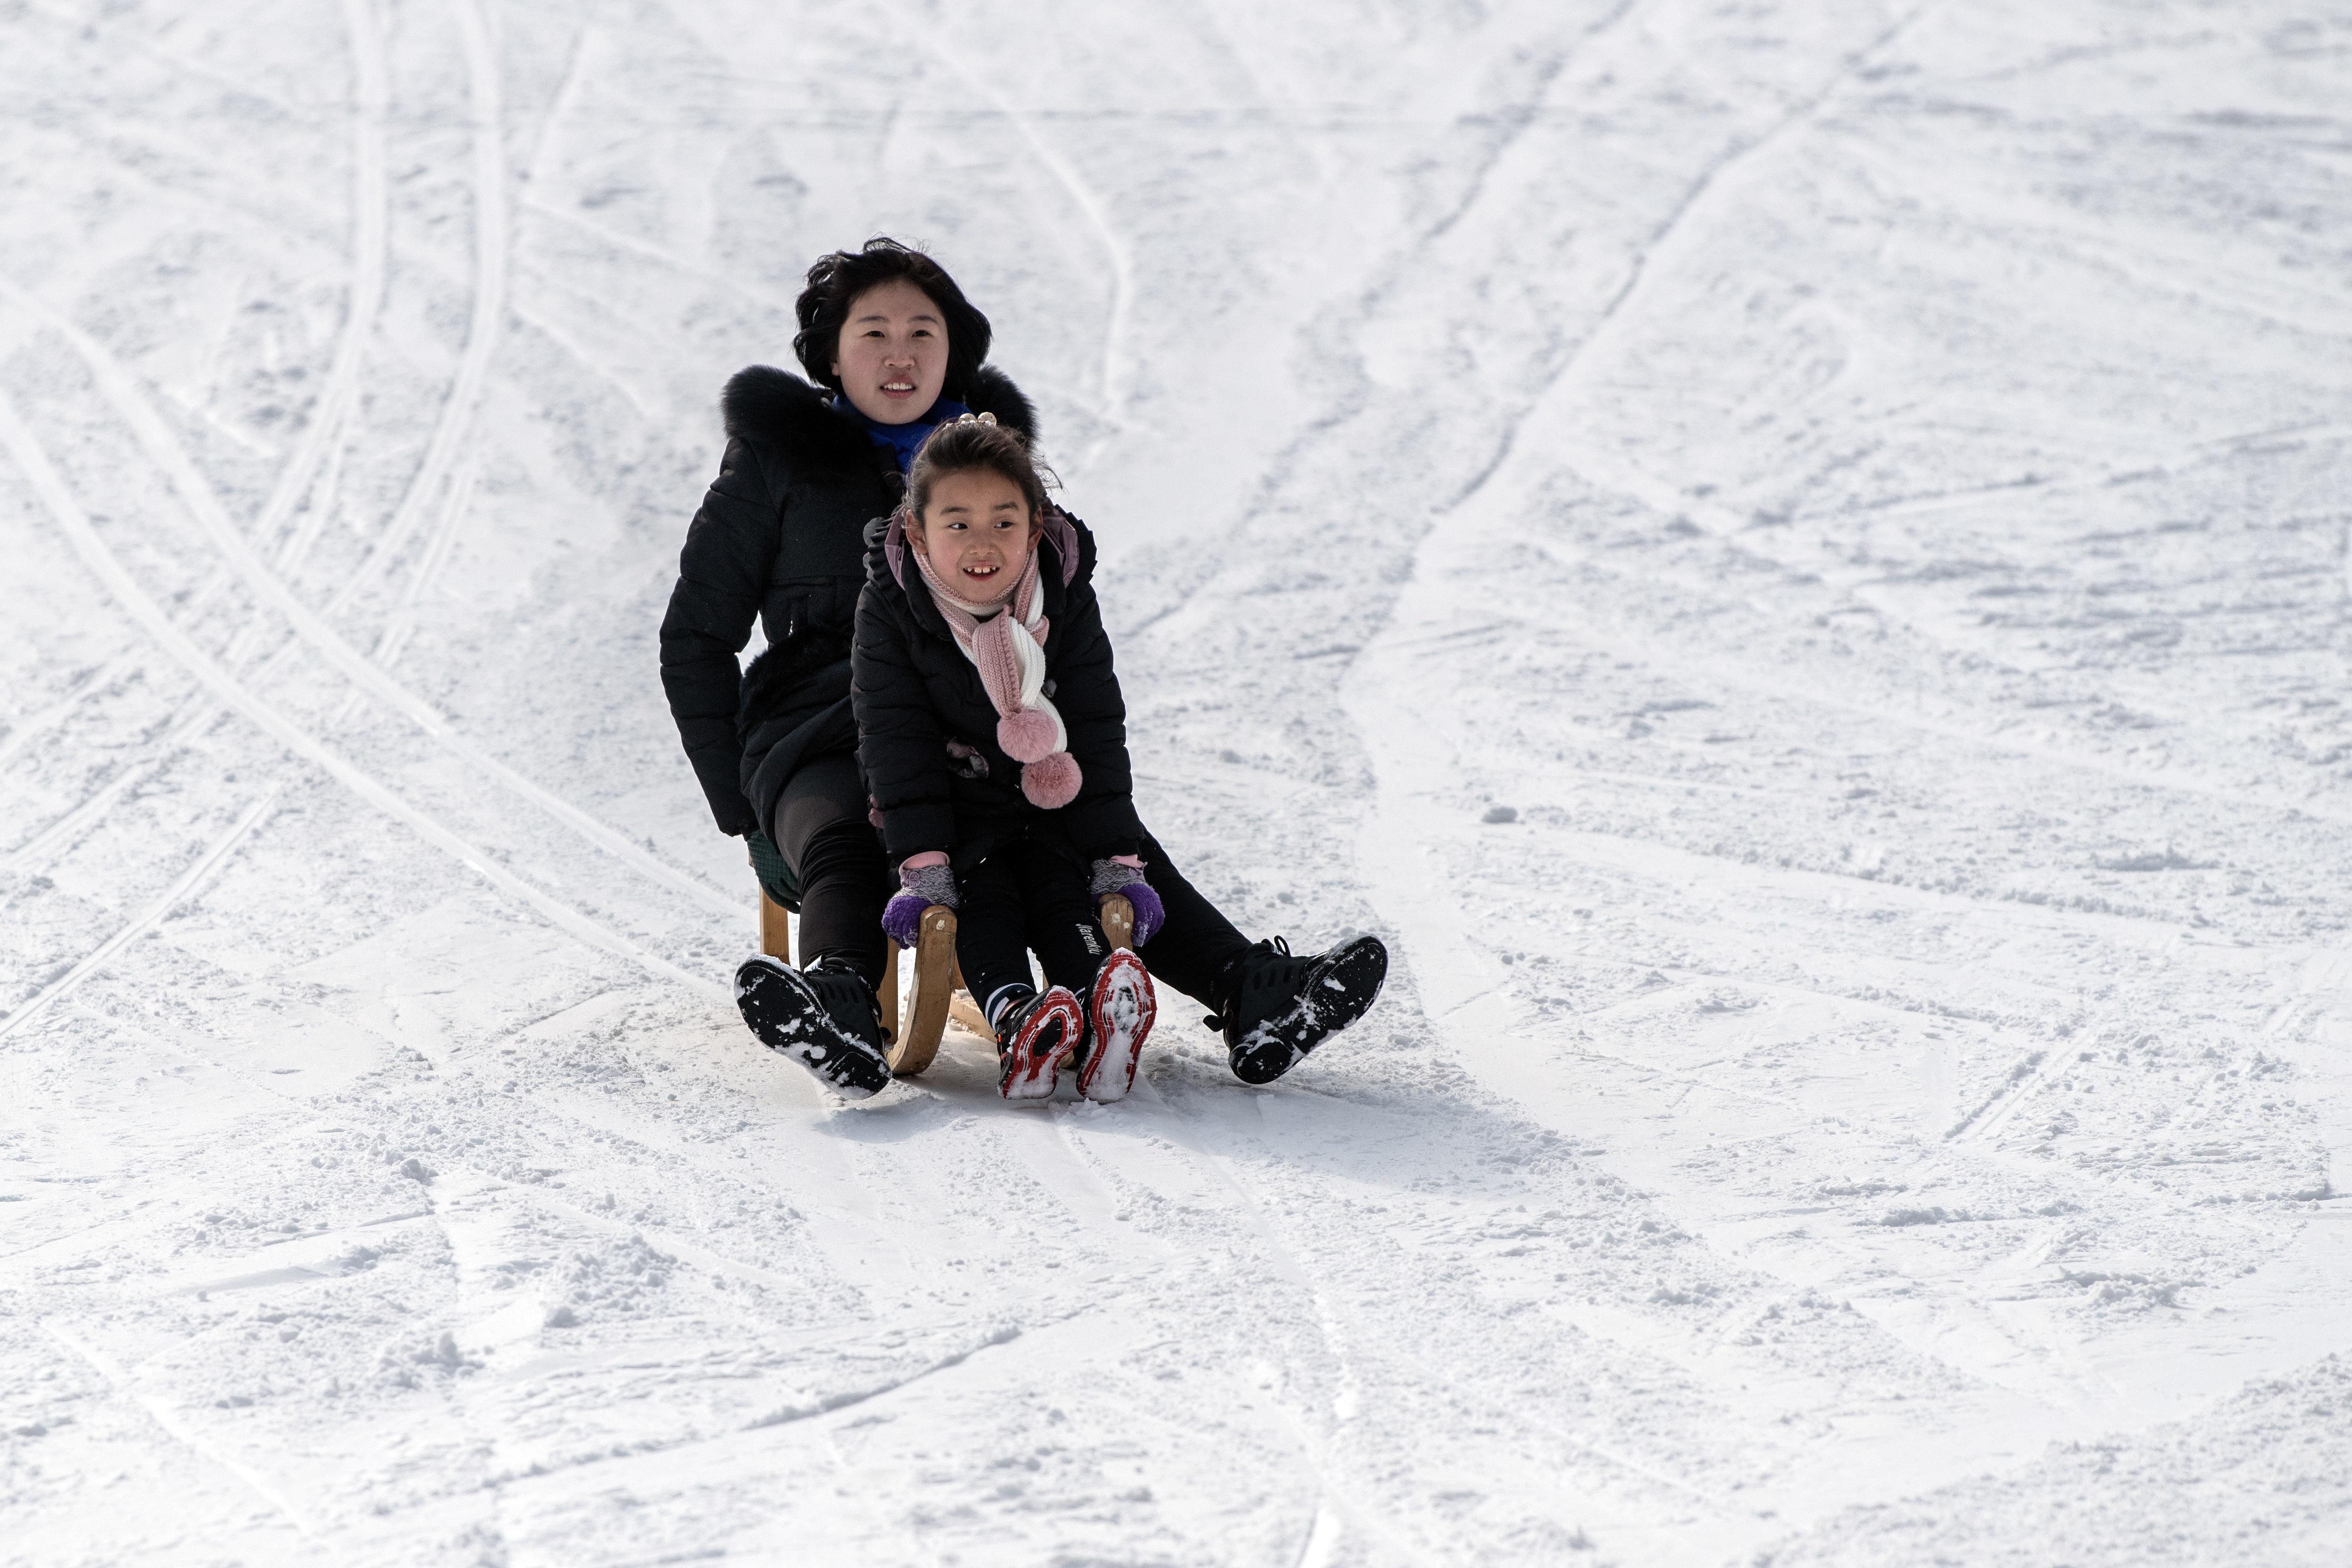 A North Korean woman and child ride a sled on a lower slope at Masikryong Ski Resort on Feb. 5, near Wonsan, North Korea.